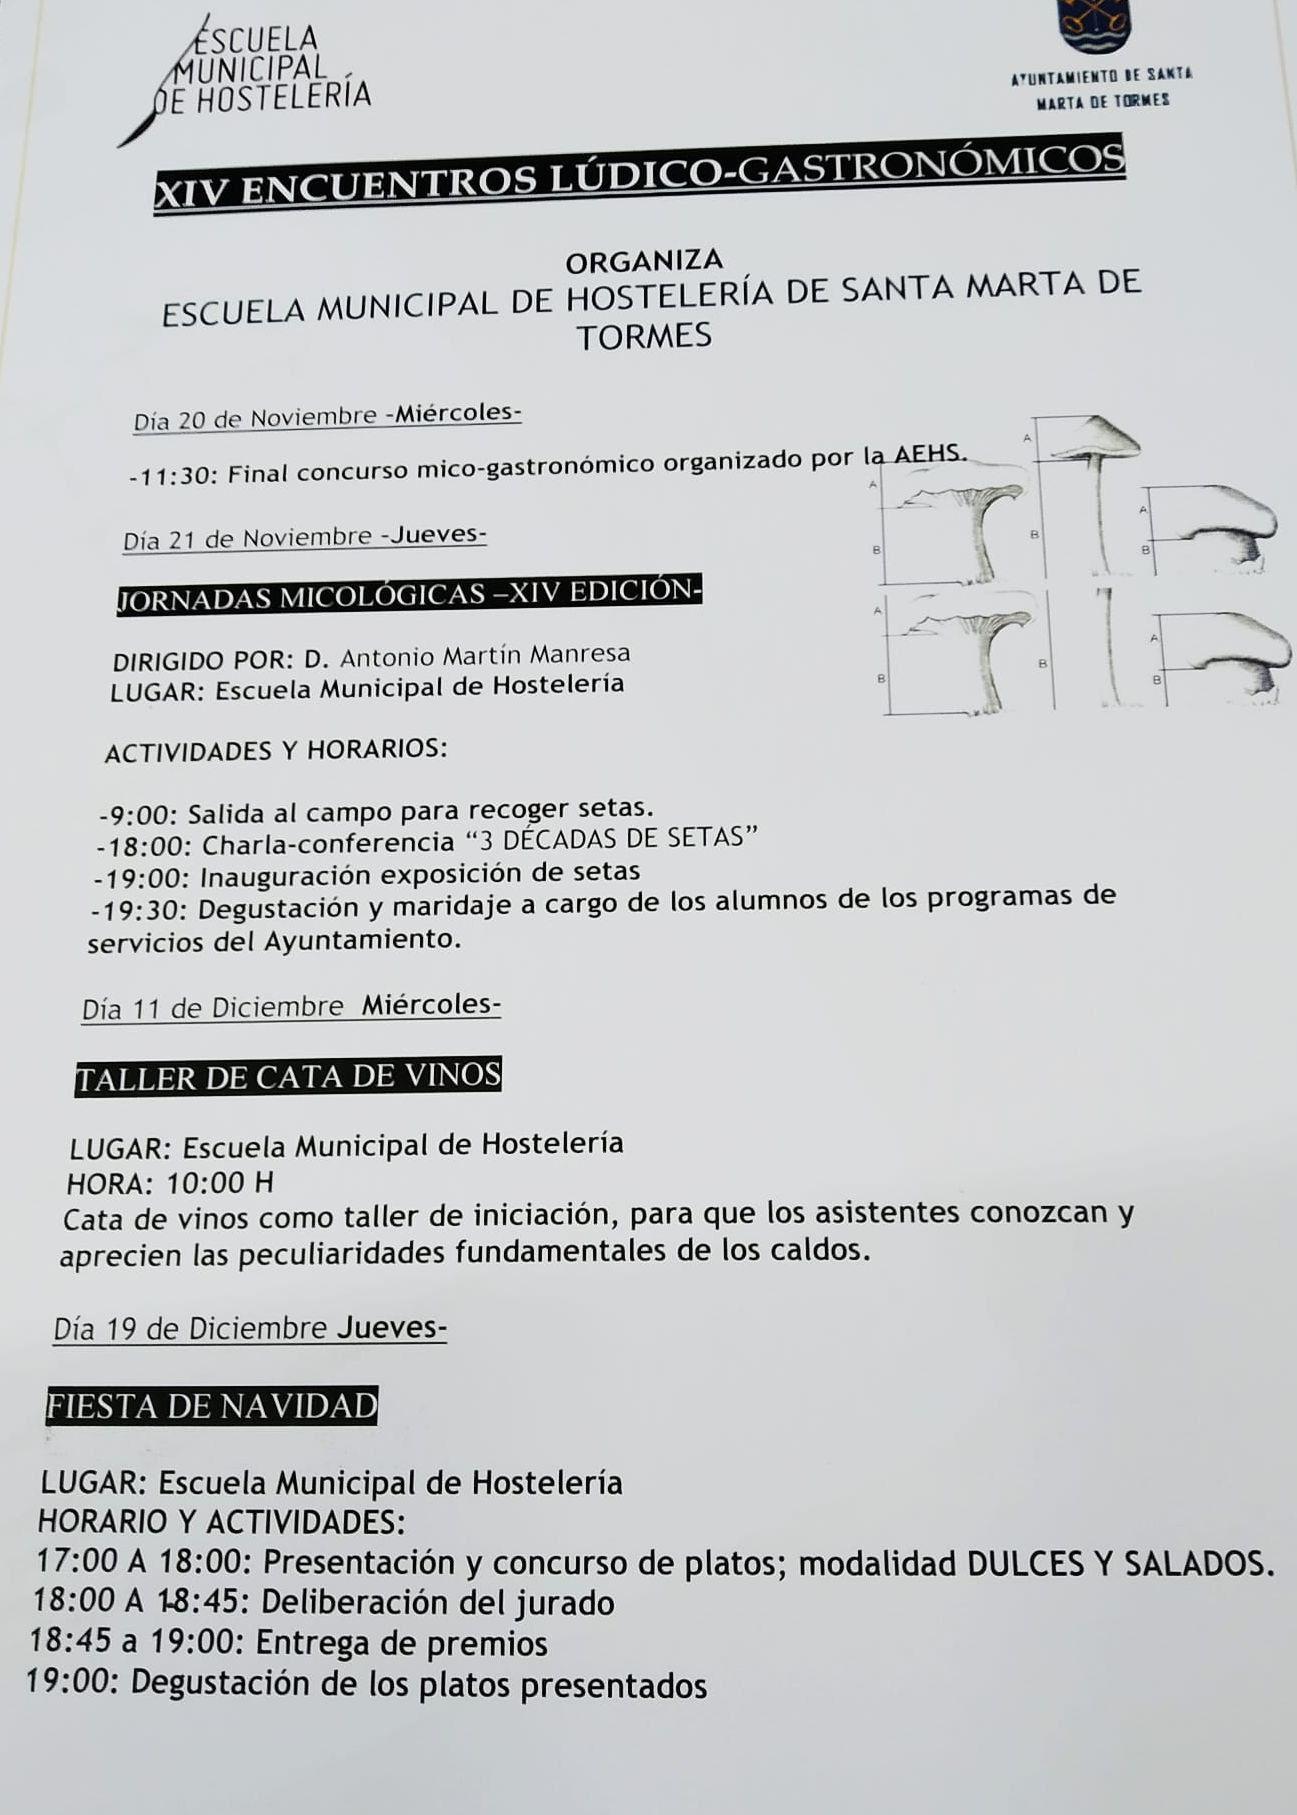 Jornadas micologicas Santa Marta de Tormes  (5)